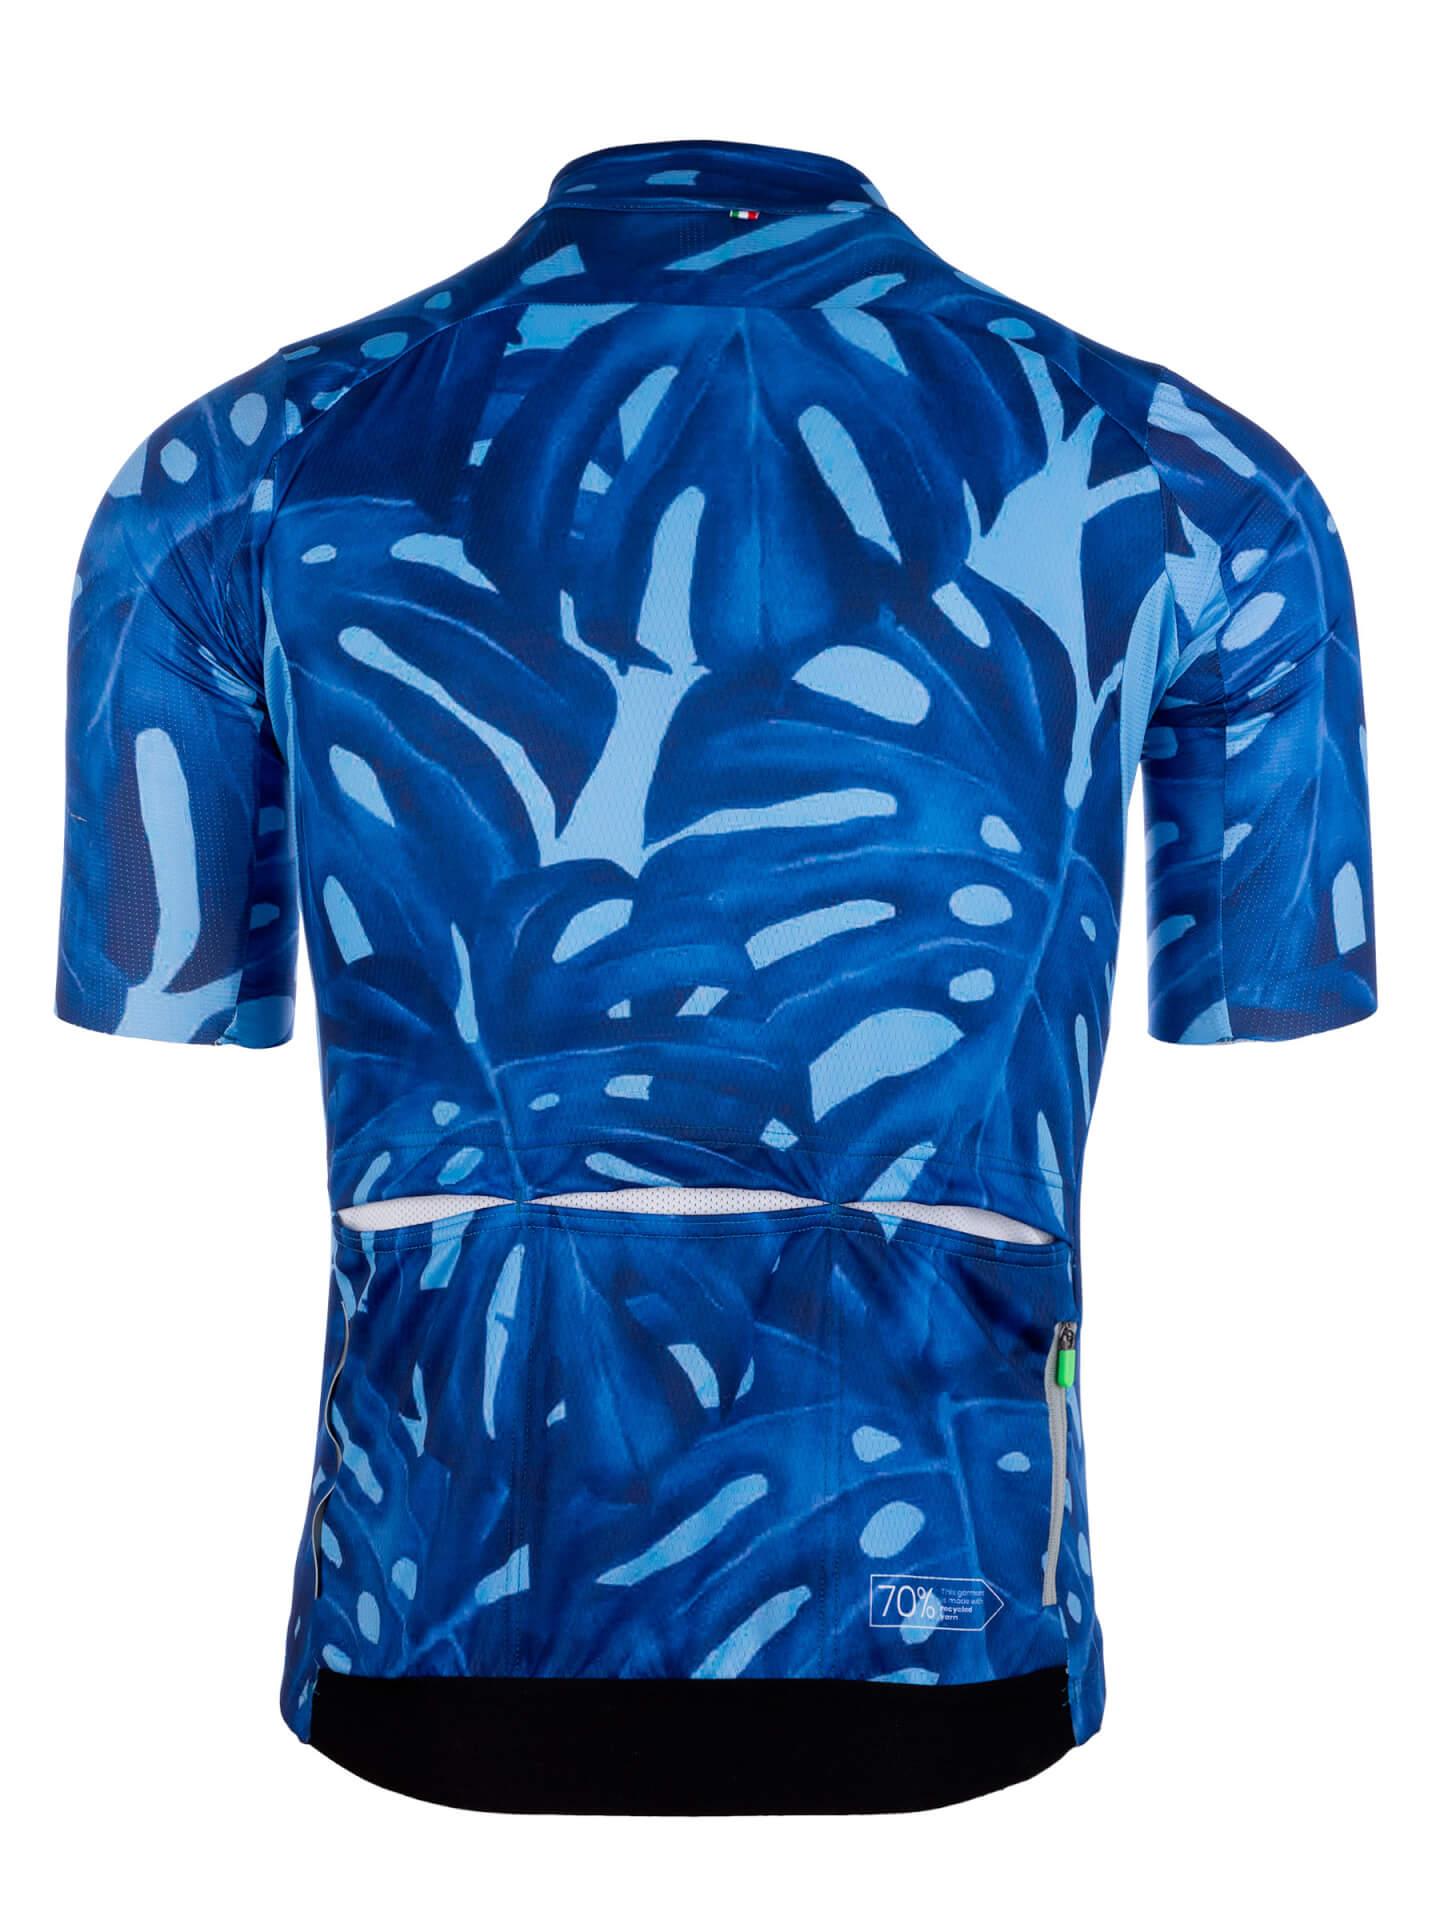 Maillot Jersey short sleeve G1 Panama bleu